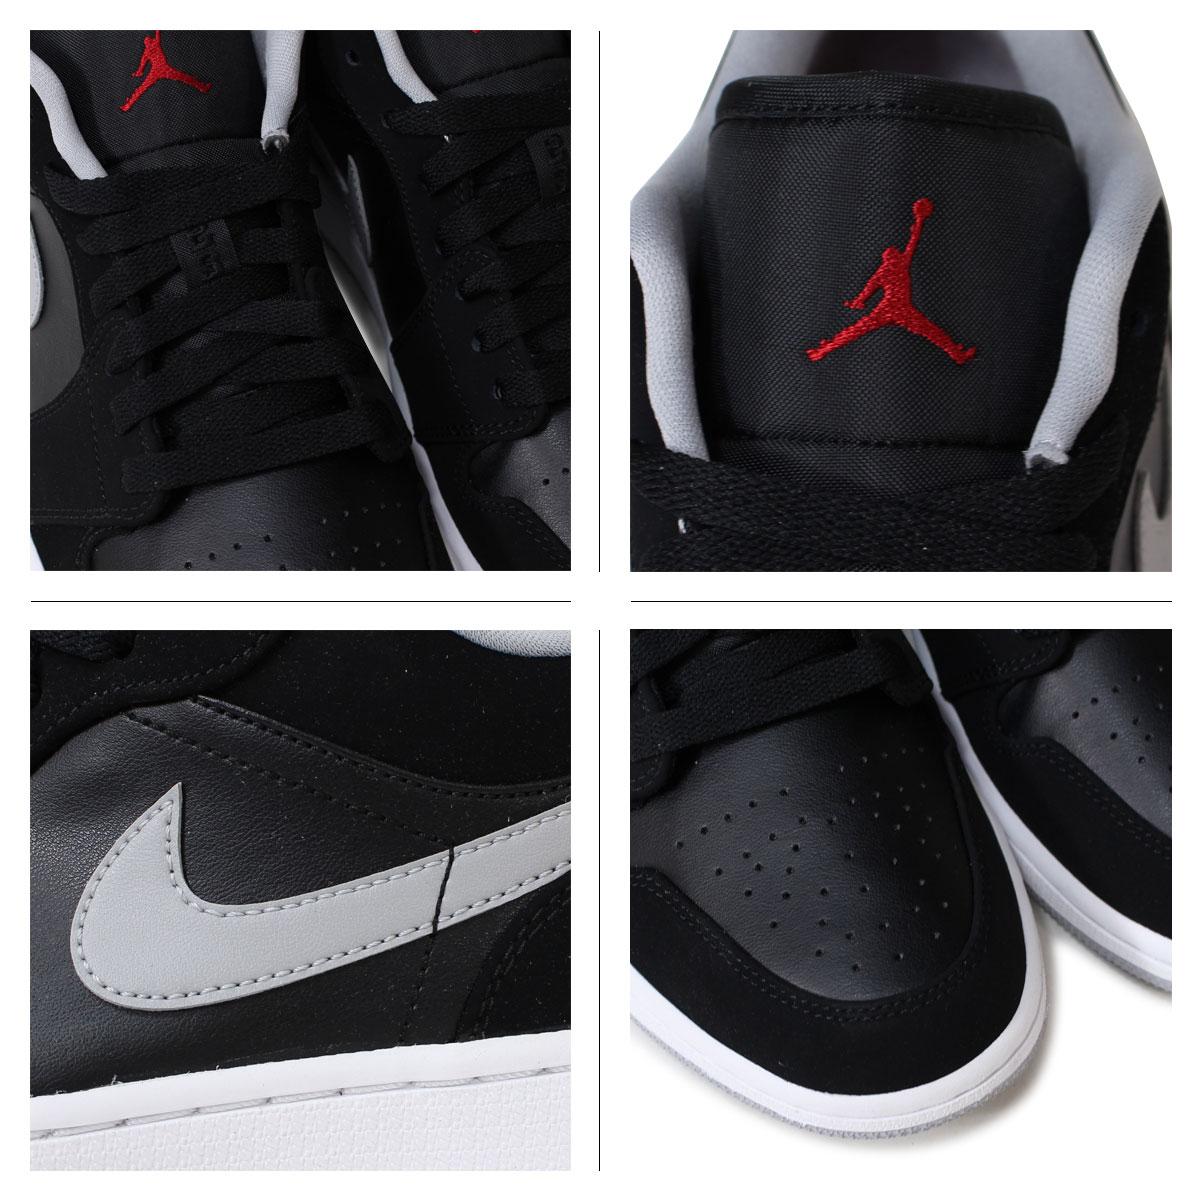 finest selection 9fe83 747c0 Nike Air Jordan NIKE sneakers men's AIR JORDAN 1 RETRO LOW Jordan retro 1  553558 - 032 shoes black [12 / 7 new in stock]